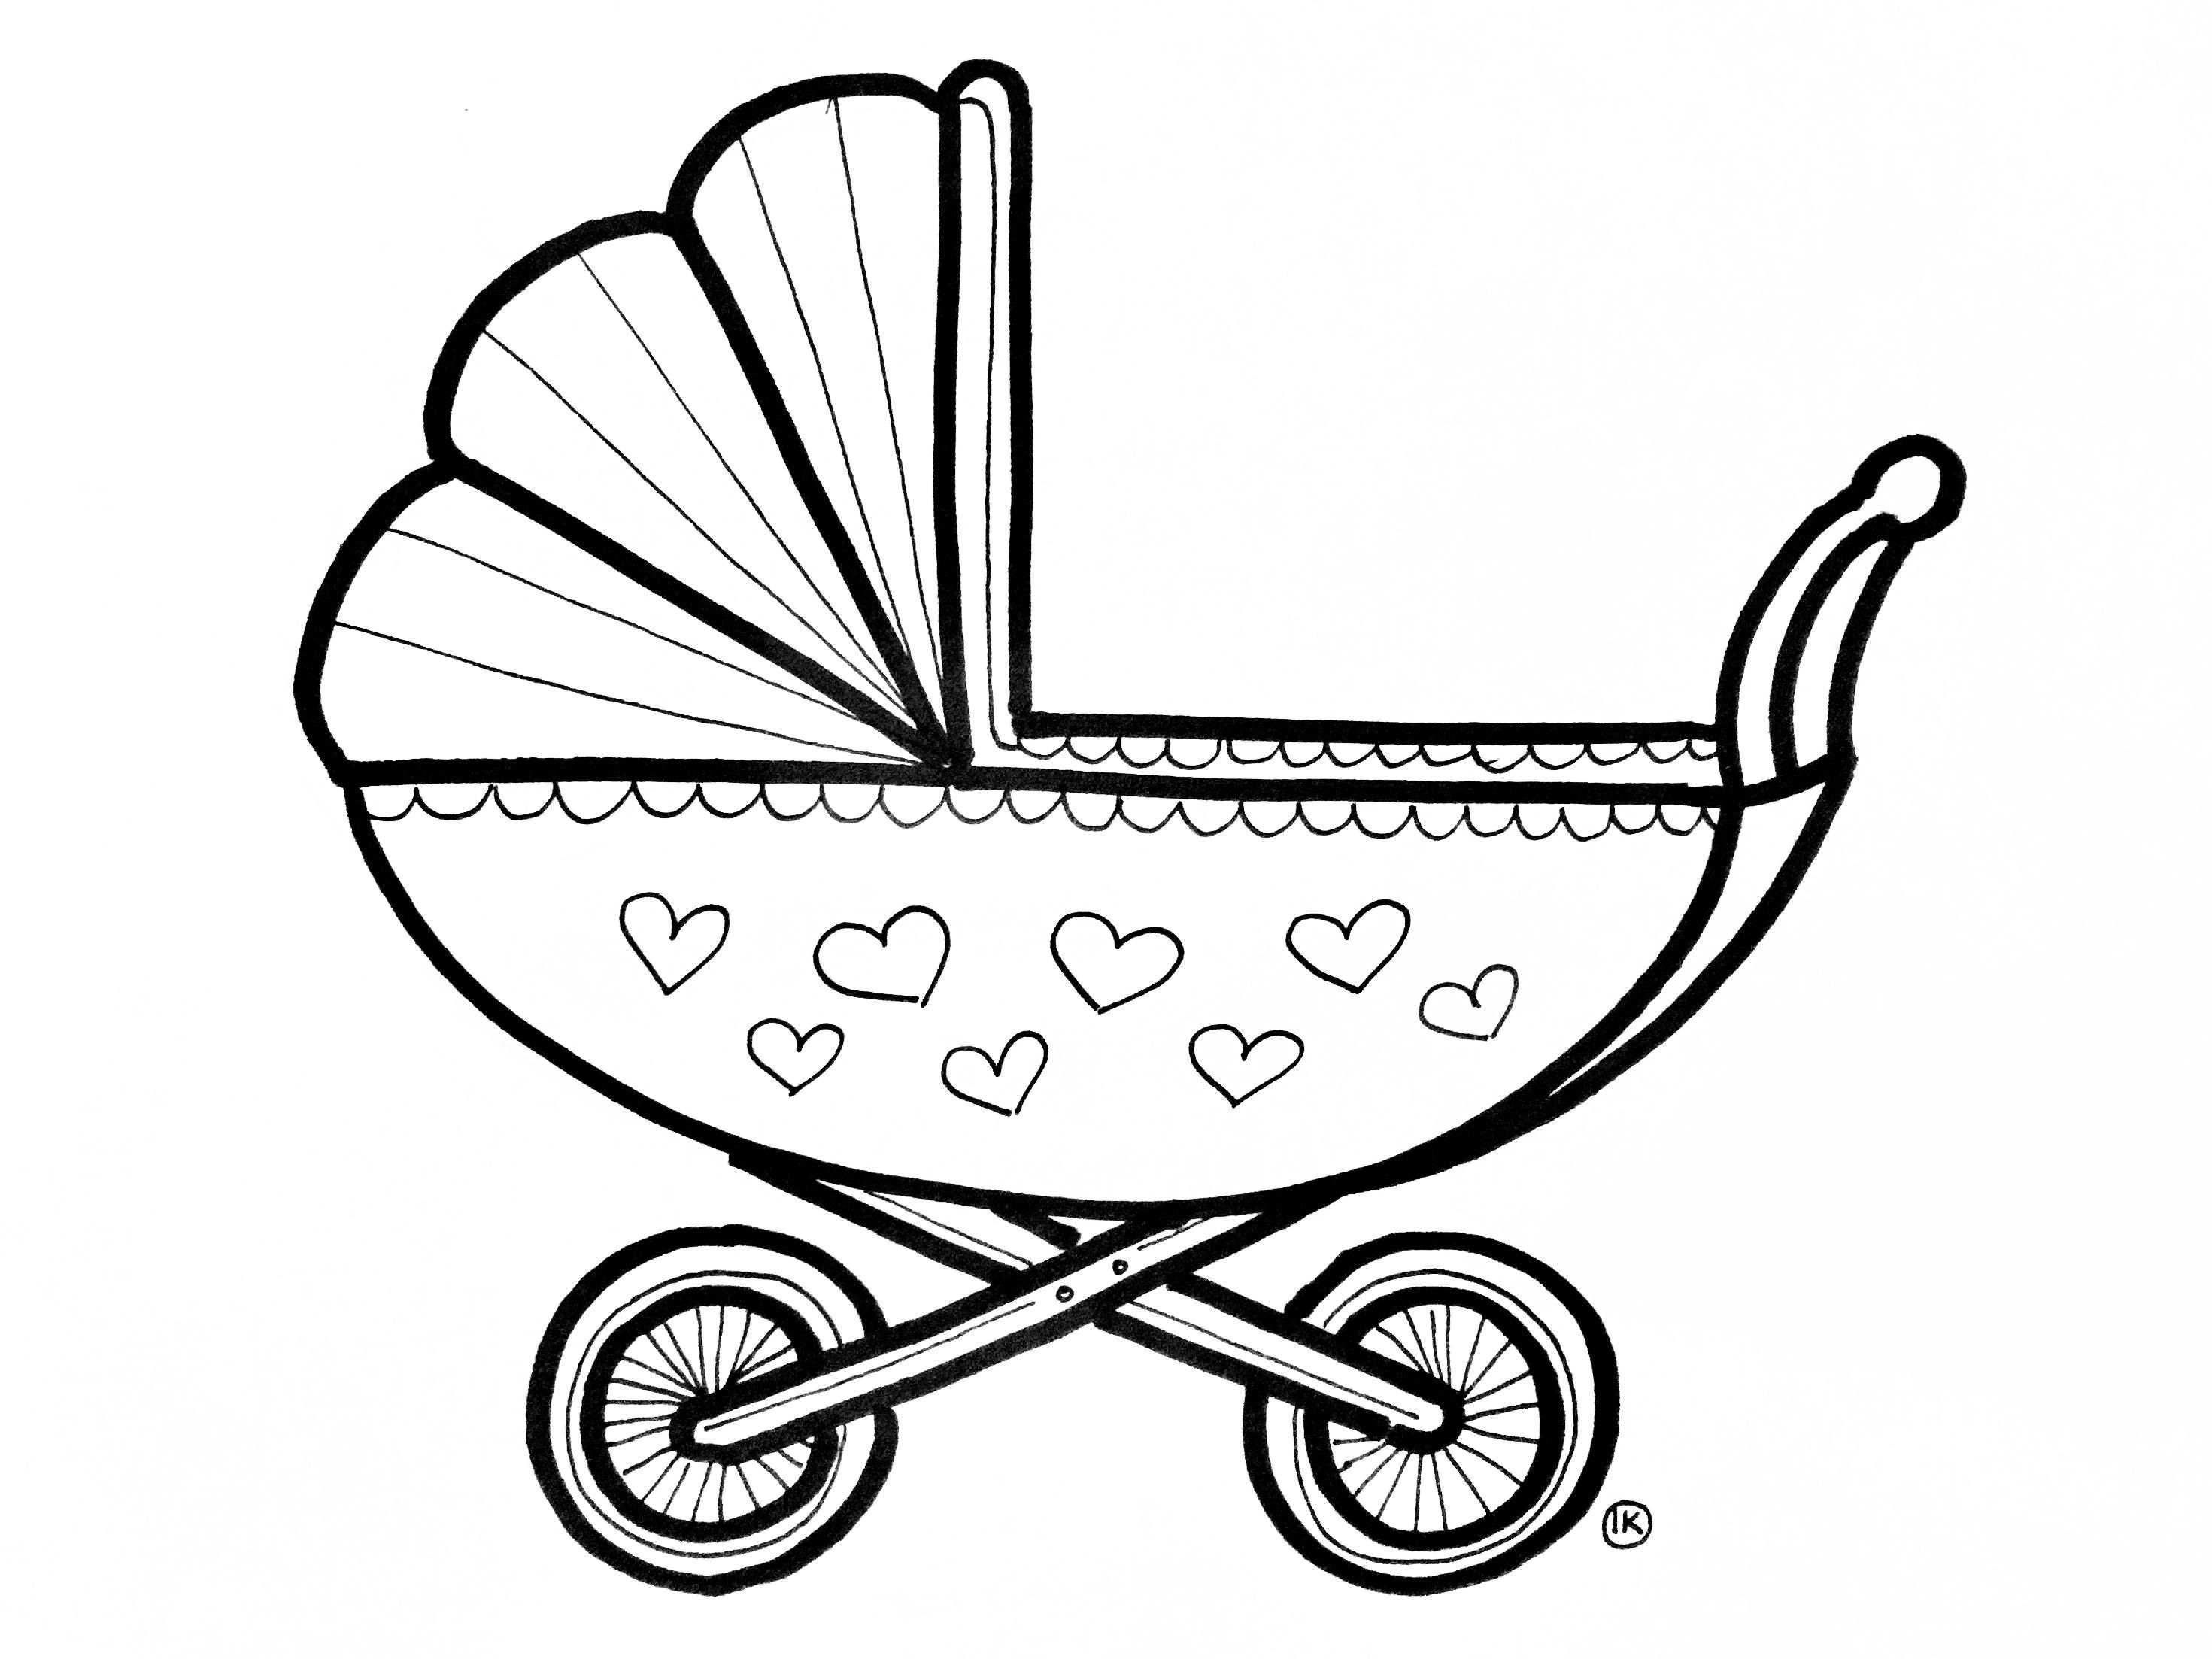 Baby Kleurplaten Geboorte Kraamcadeau Babyshower Kleurplaat Baby Geboren Baby Kleurplaat Kleurplaten G Diy Kraamcadeaus Diy Babyspullen Kleurplaten